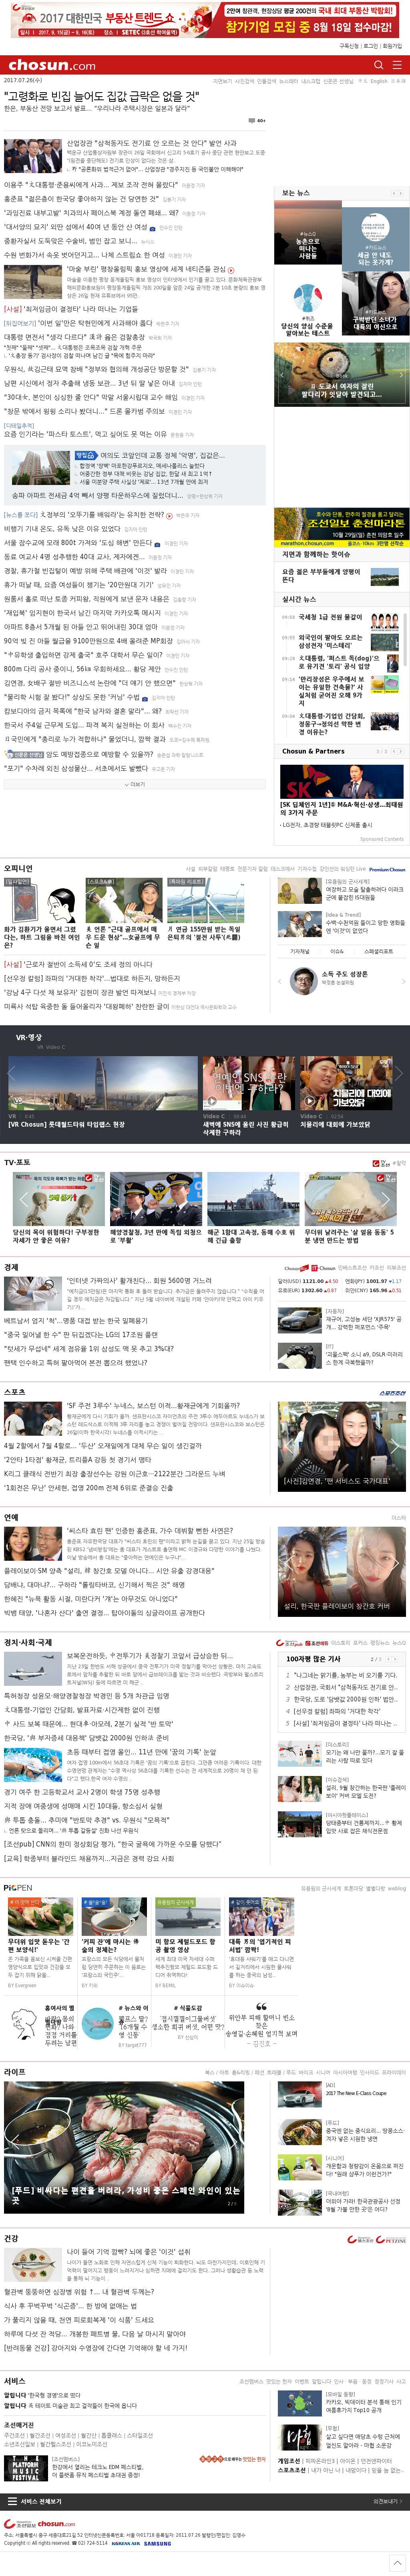 chosun.com at Wednesday July 26, 2017, 10:01 a.m. UTC